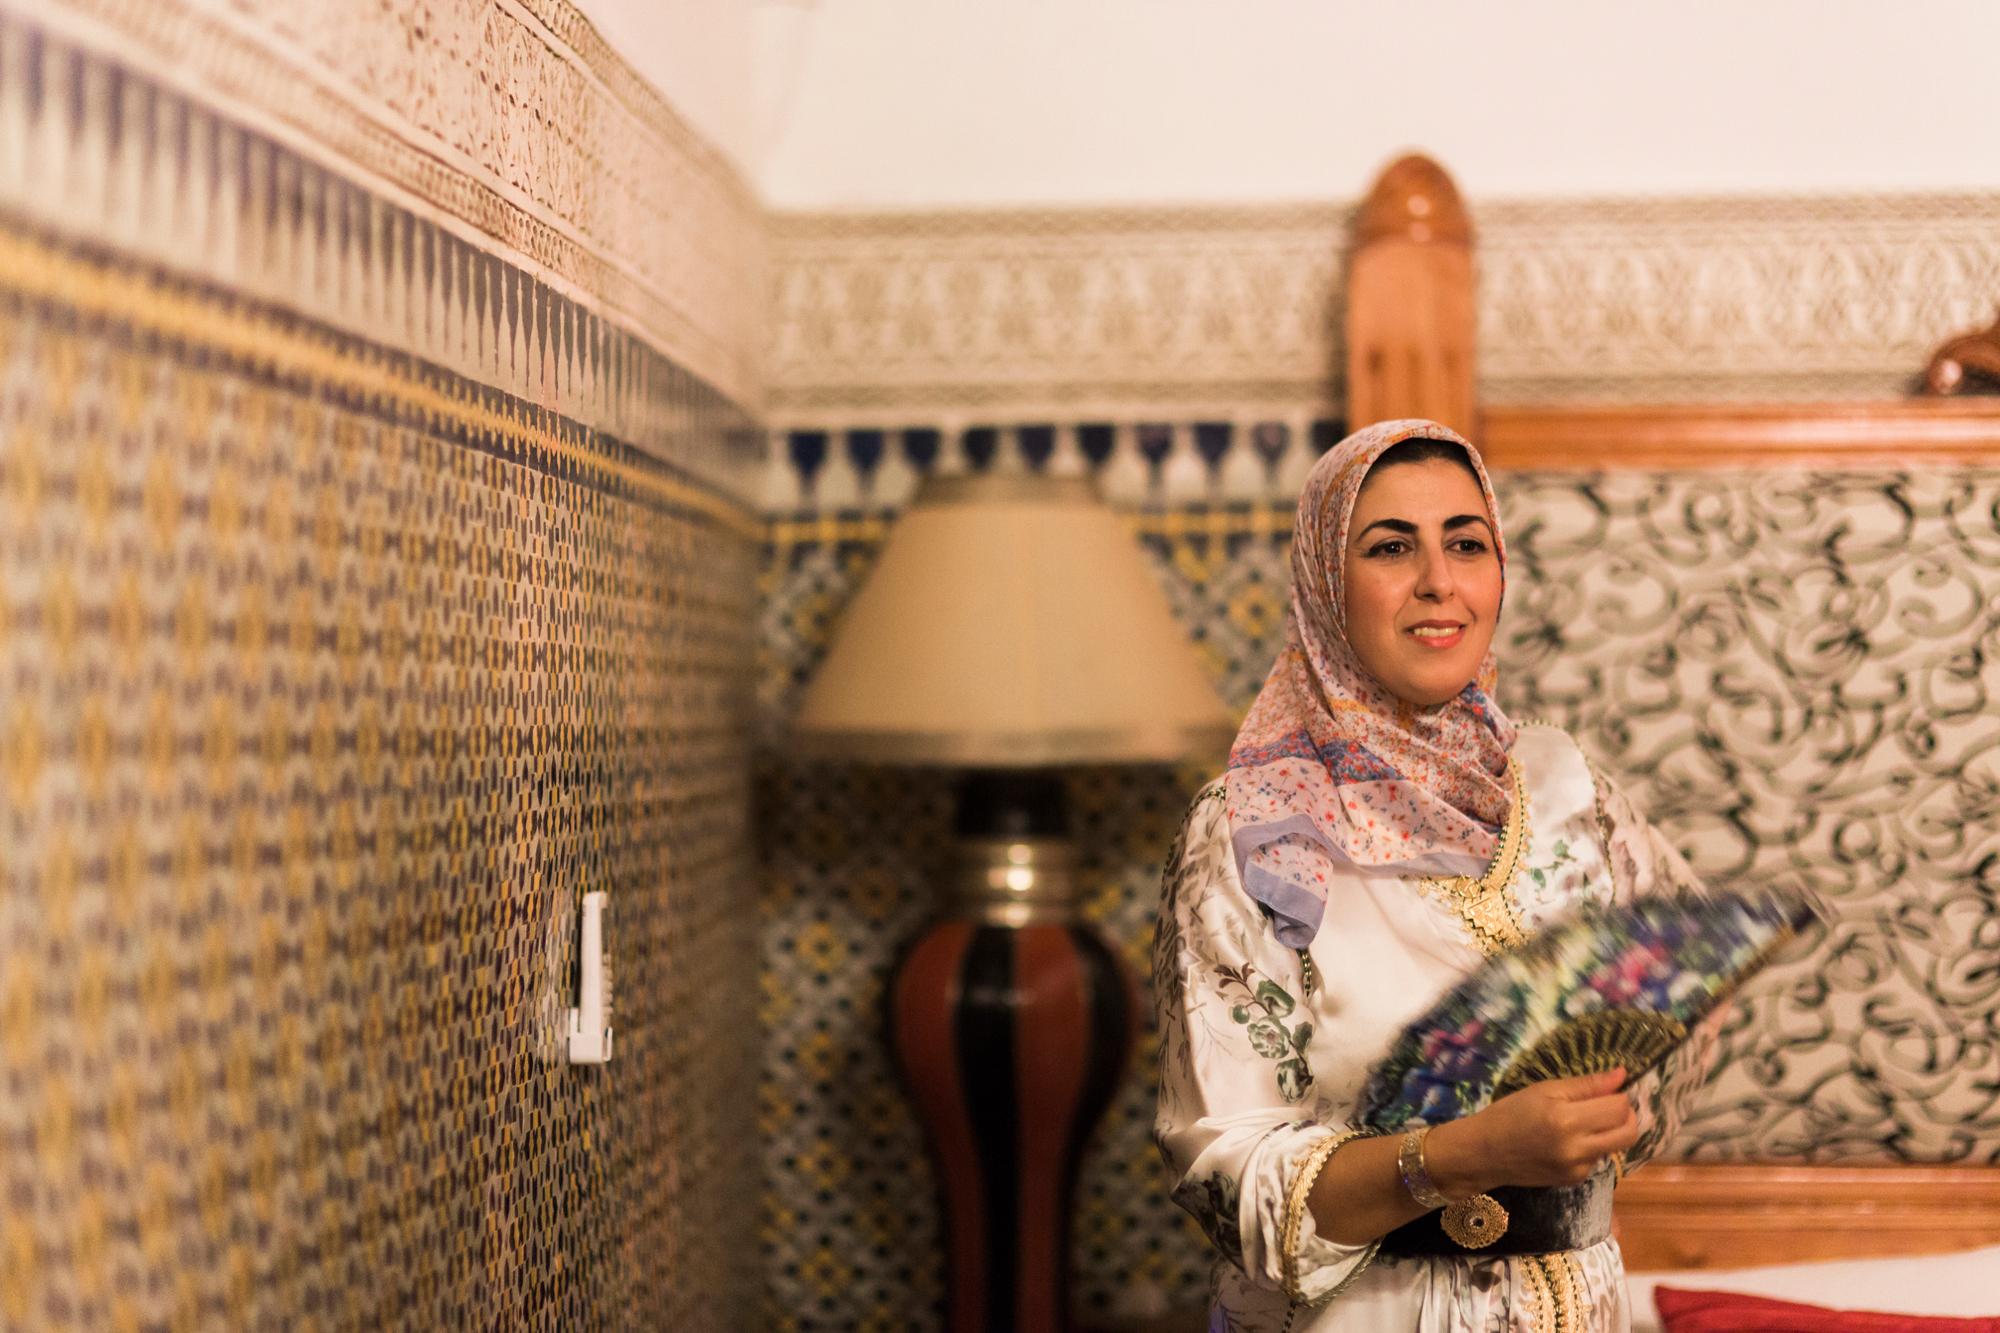 marrakech-morocco-destination-wedding-lilouette-05.jpg